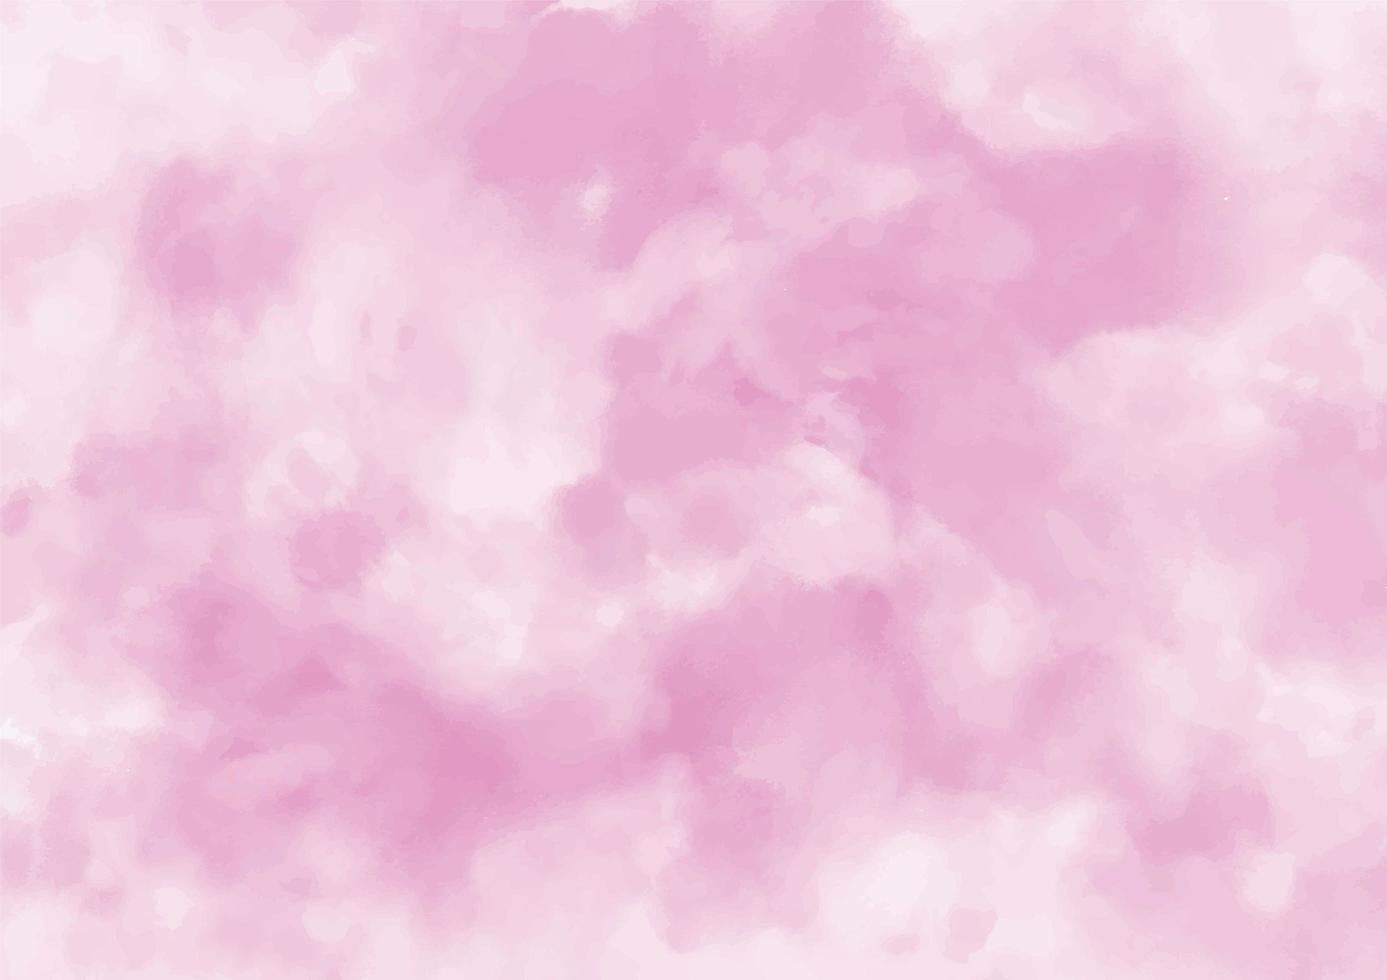 fundo aquarela rosa delicado vetor